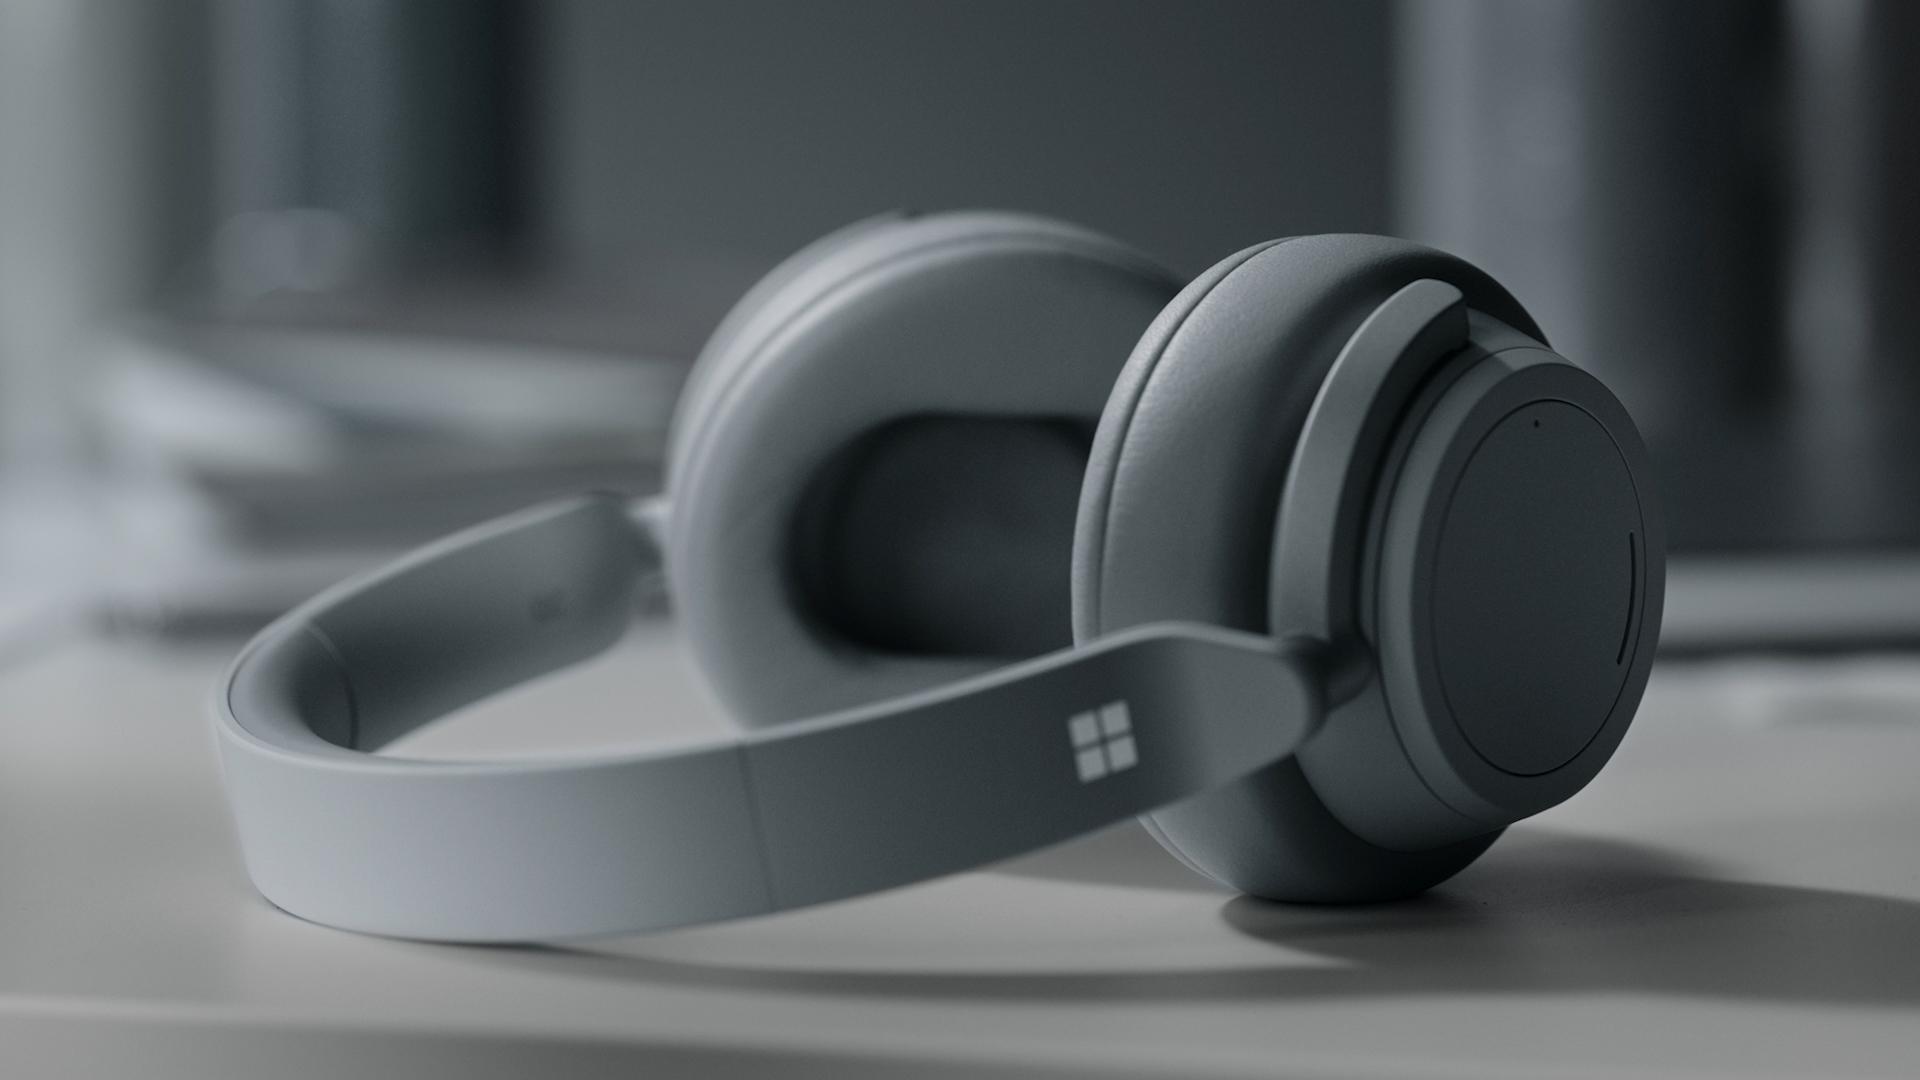 medium resolution of meet the new surface headphones the smarter way to listen microsoft surface